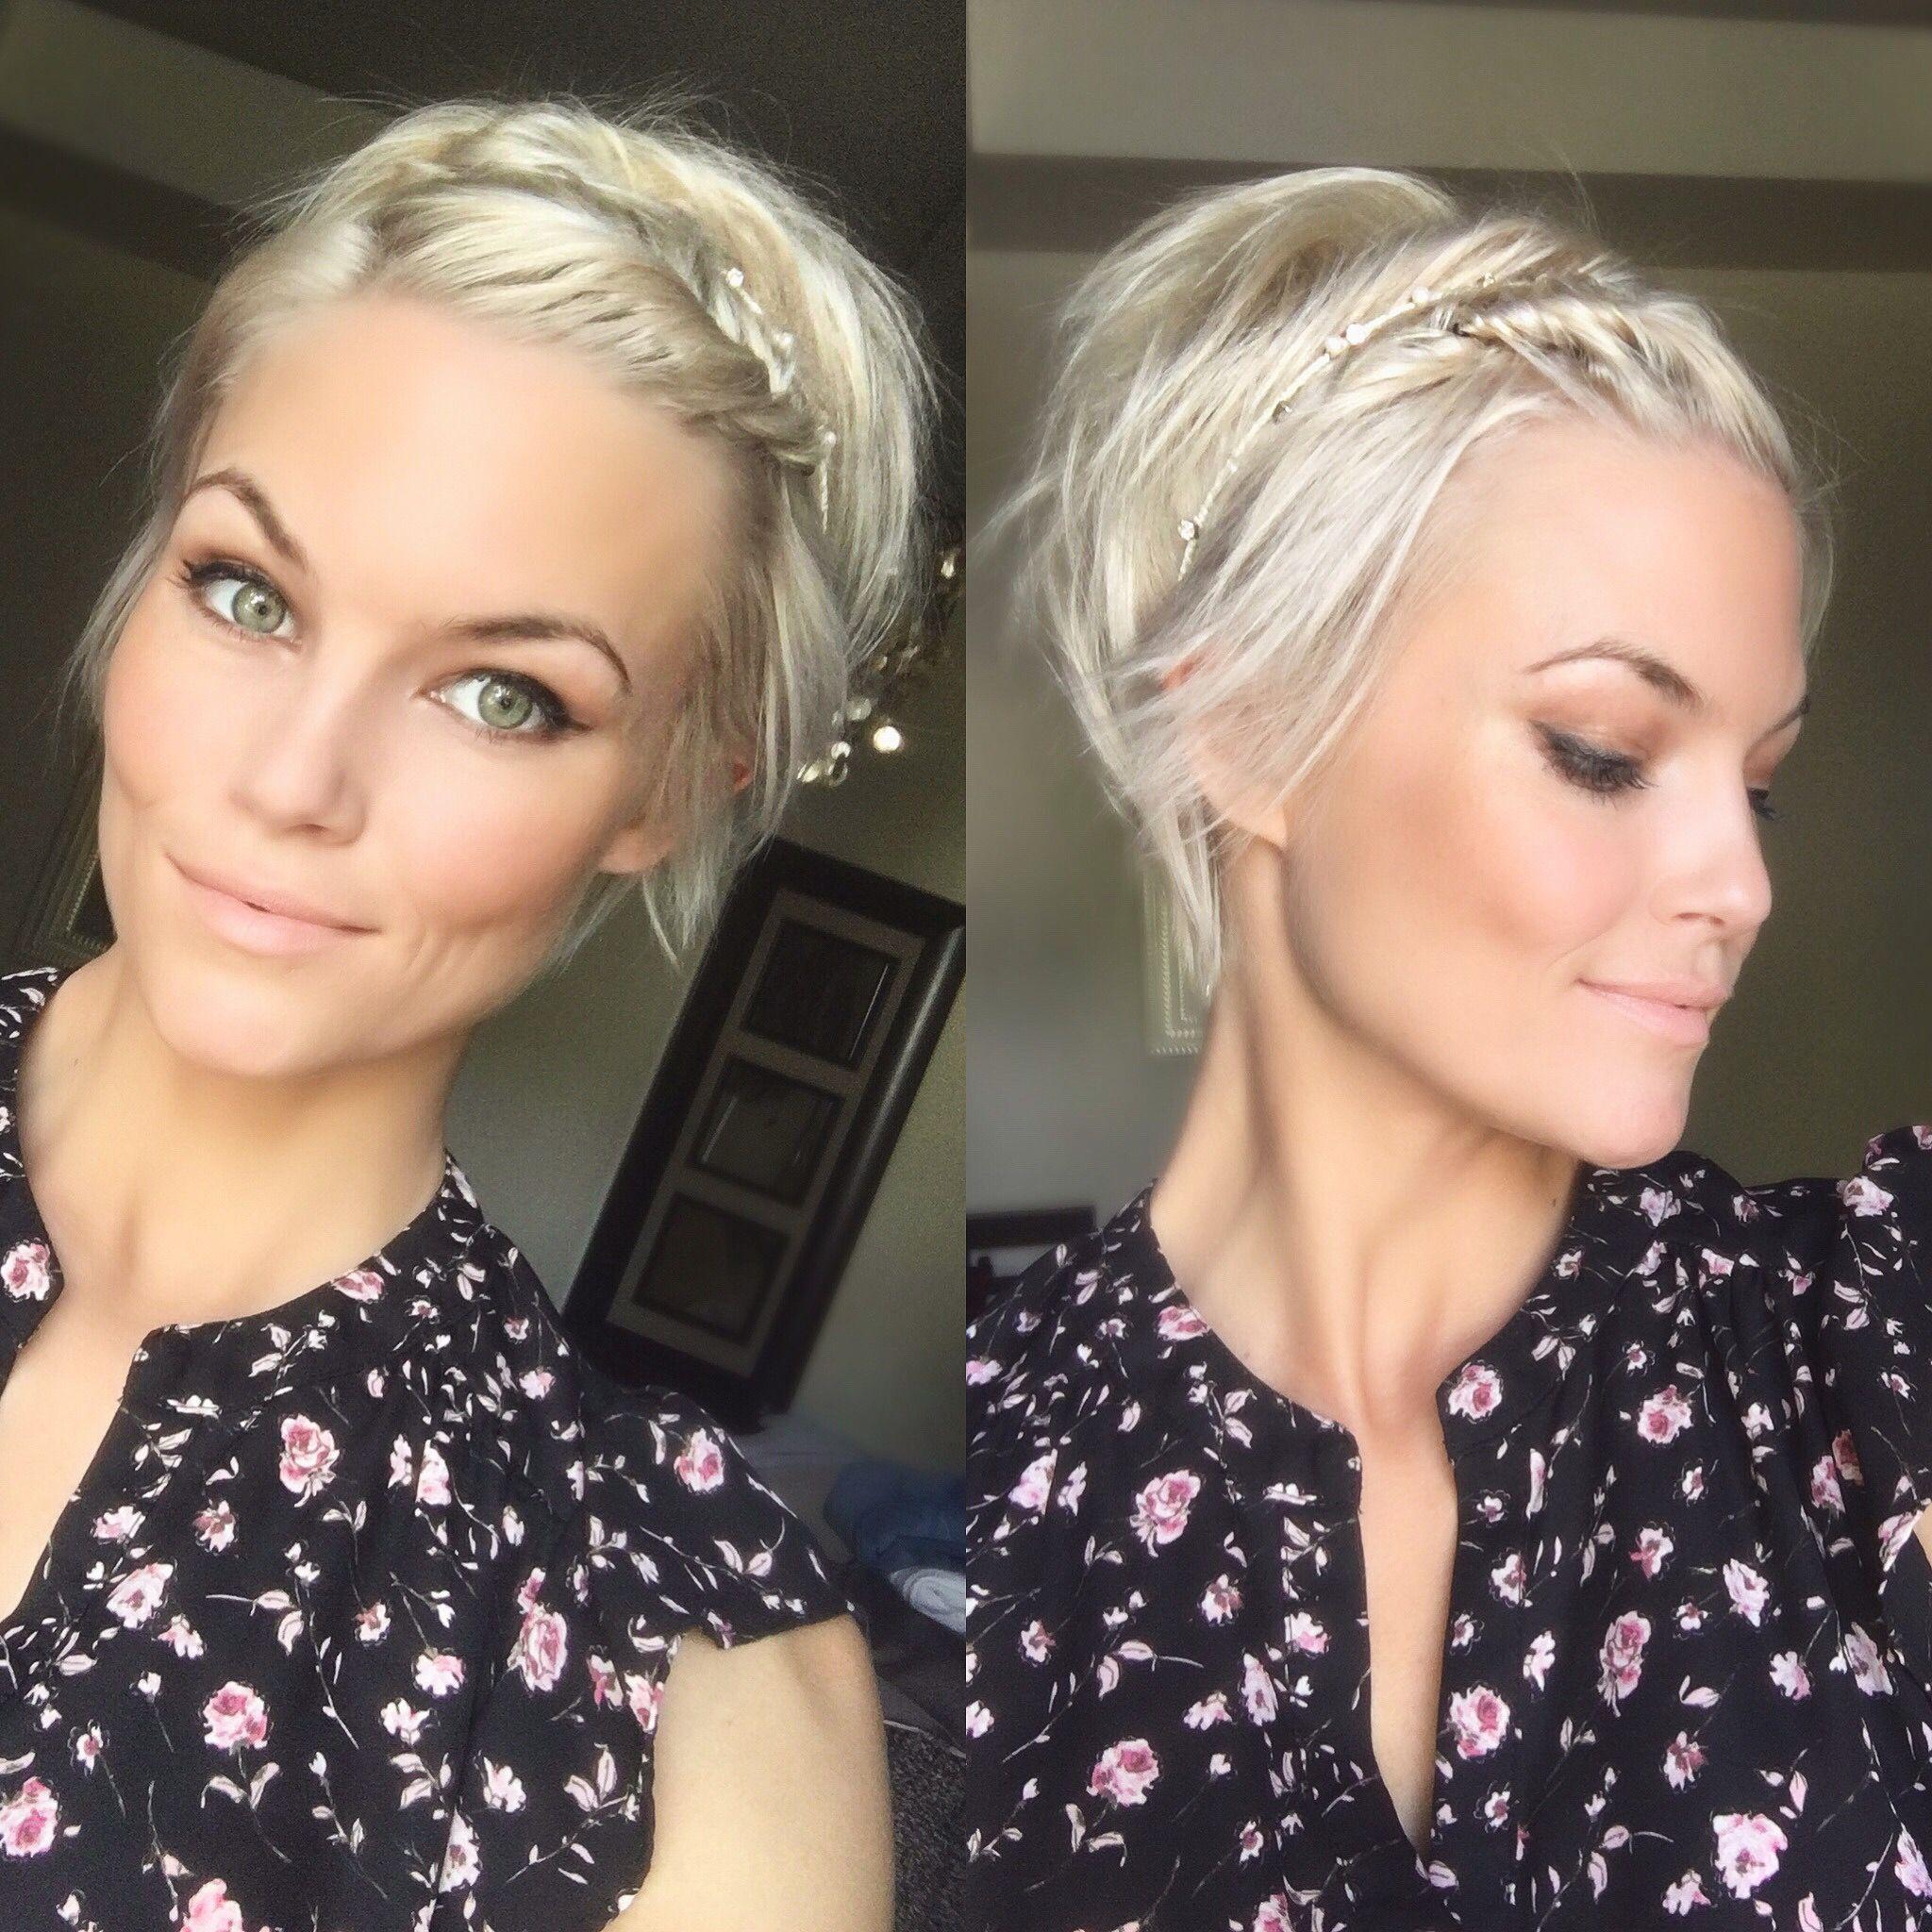 Short blonde hair krissafowles Hair Pinterest